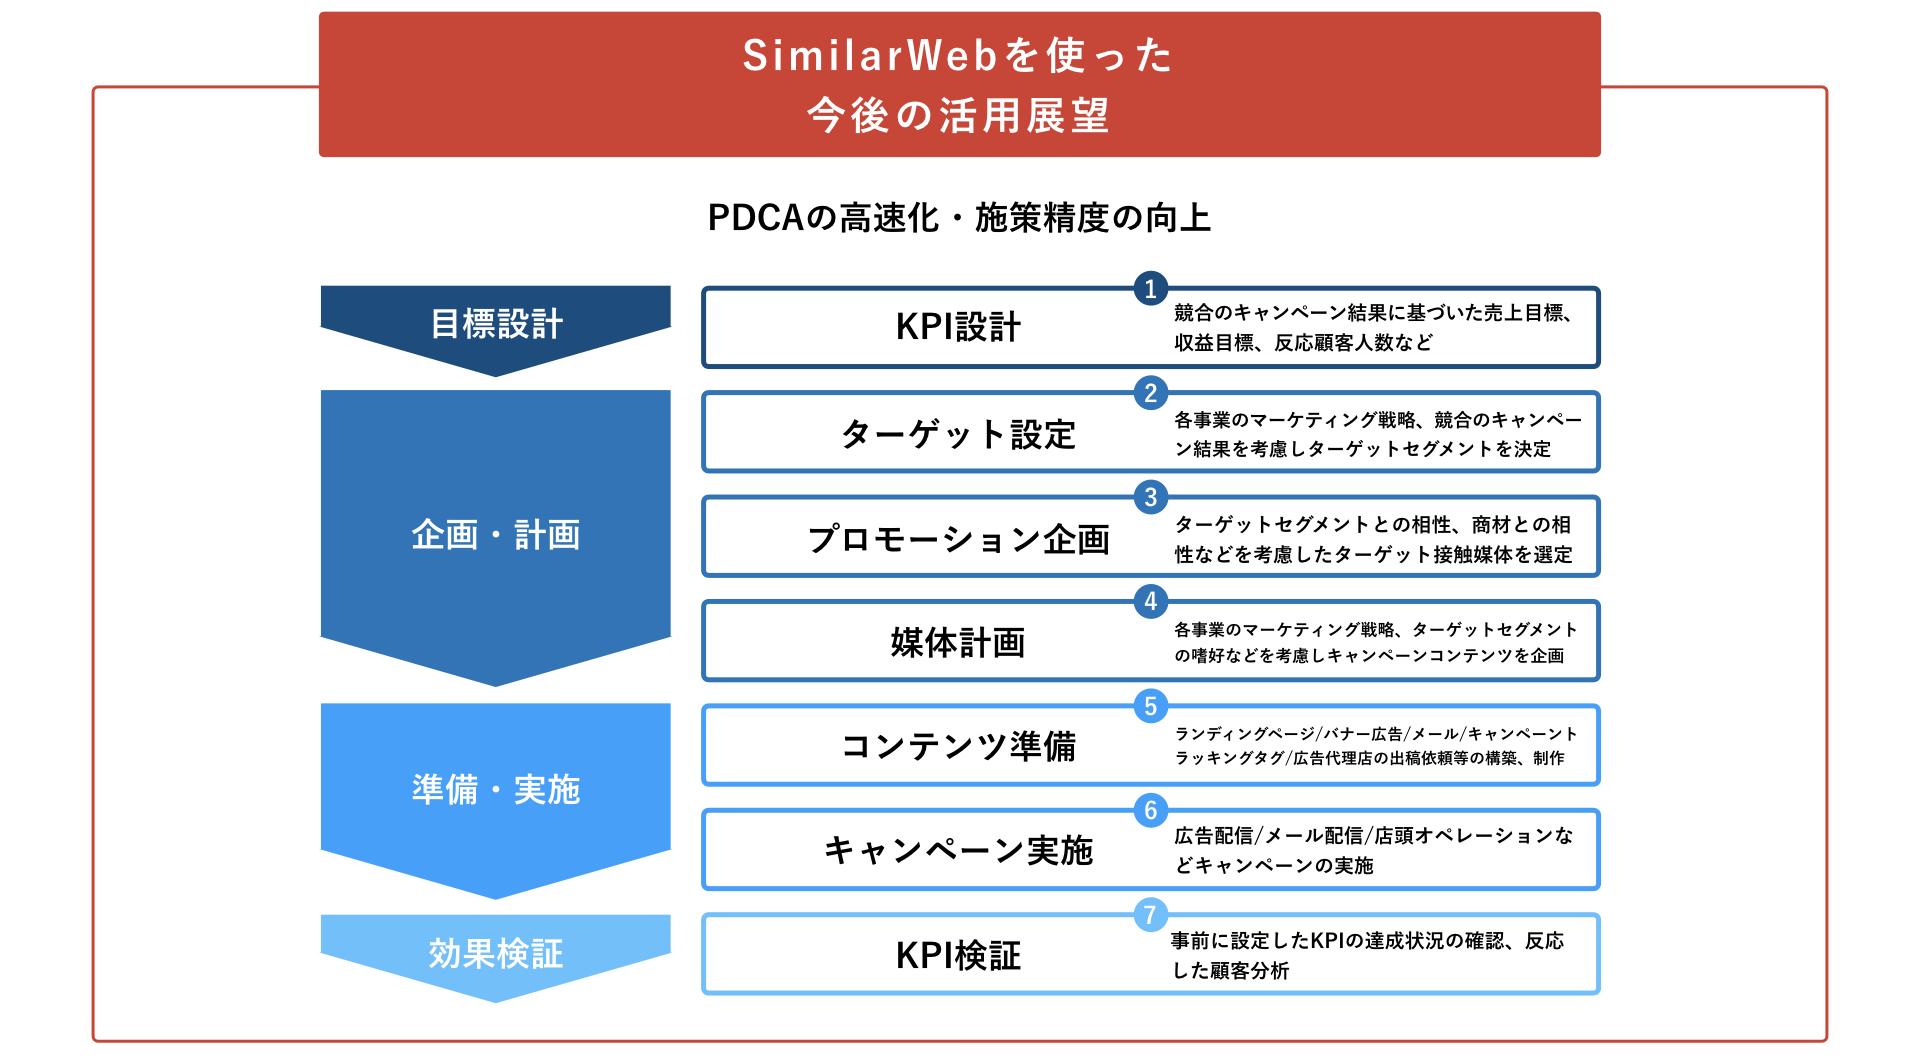 SimilarWebを使った今後の活用展望